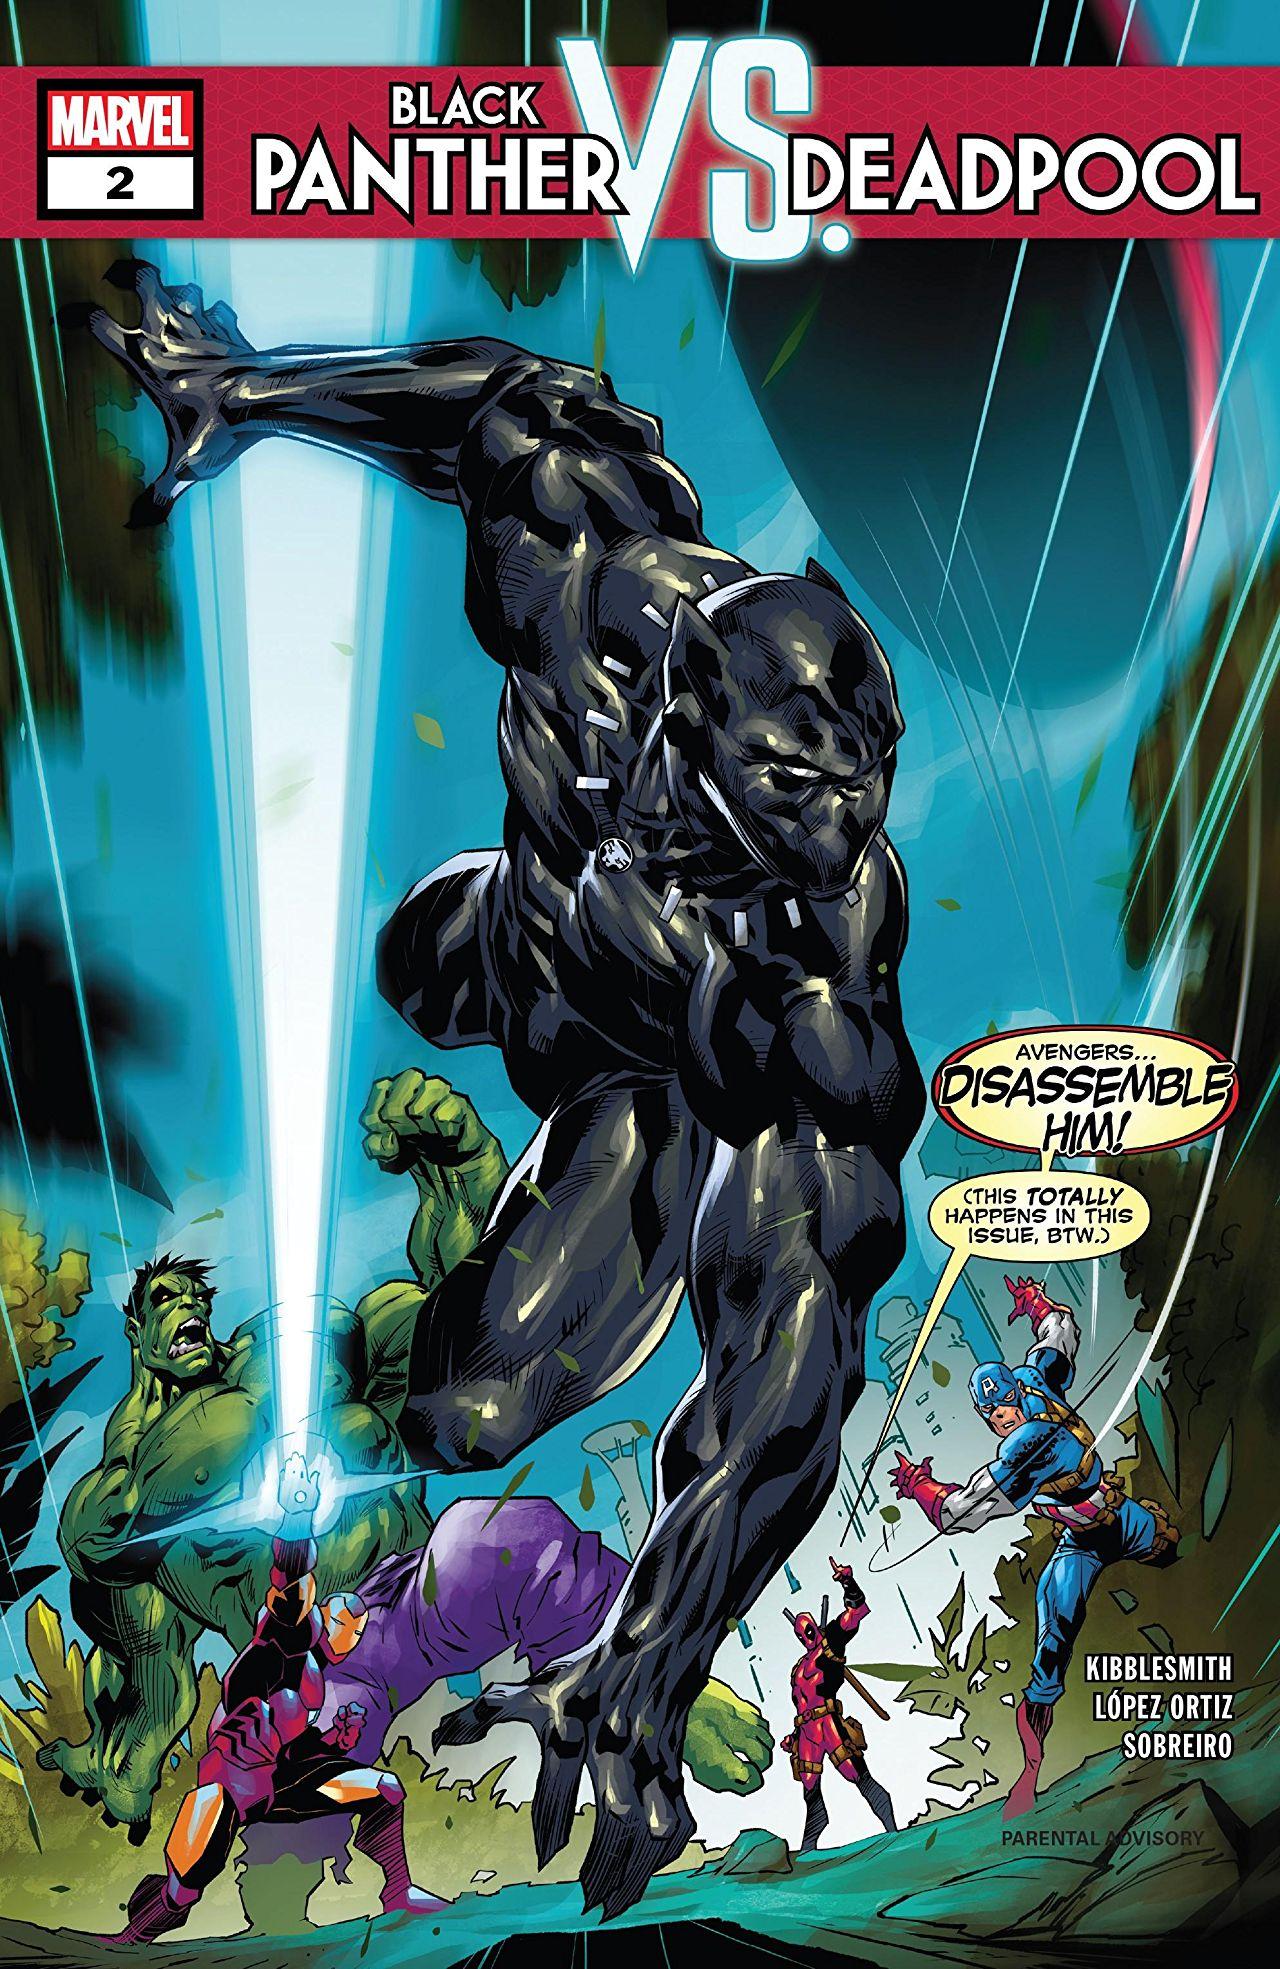 Black Panther vs. Deadpool Vol 1 2